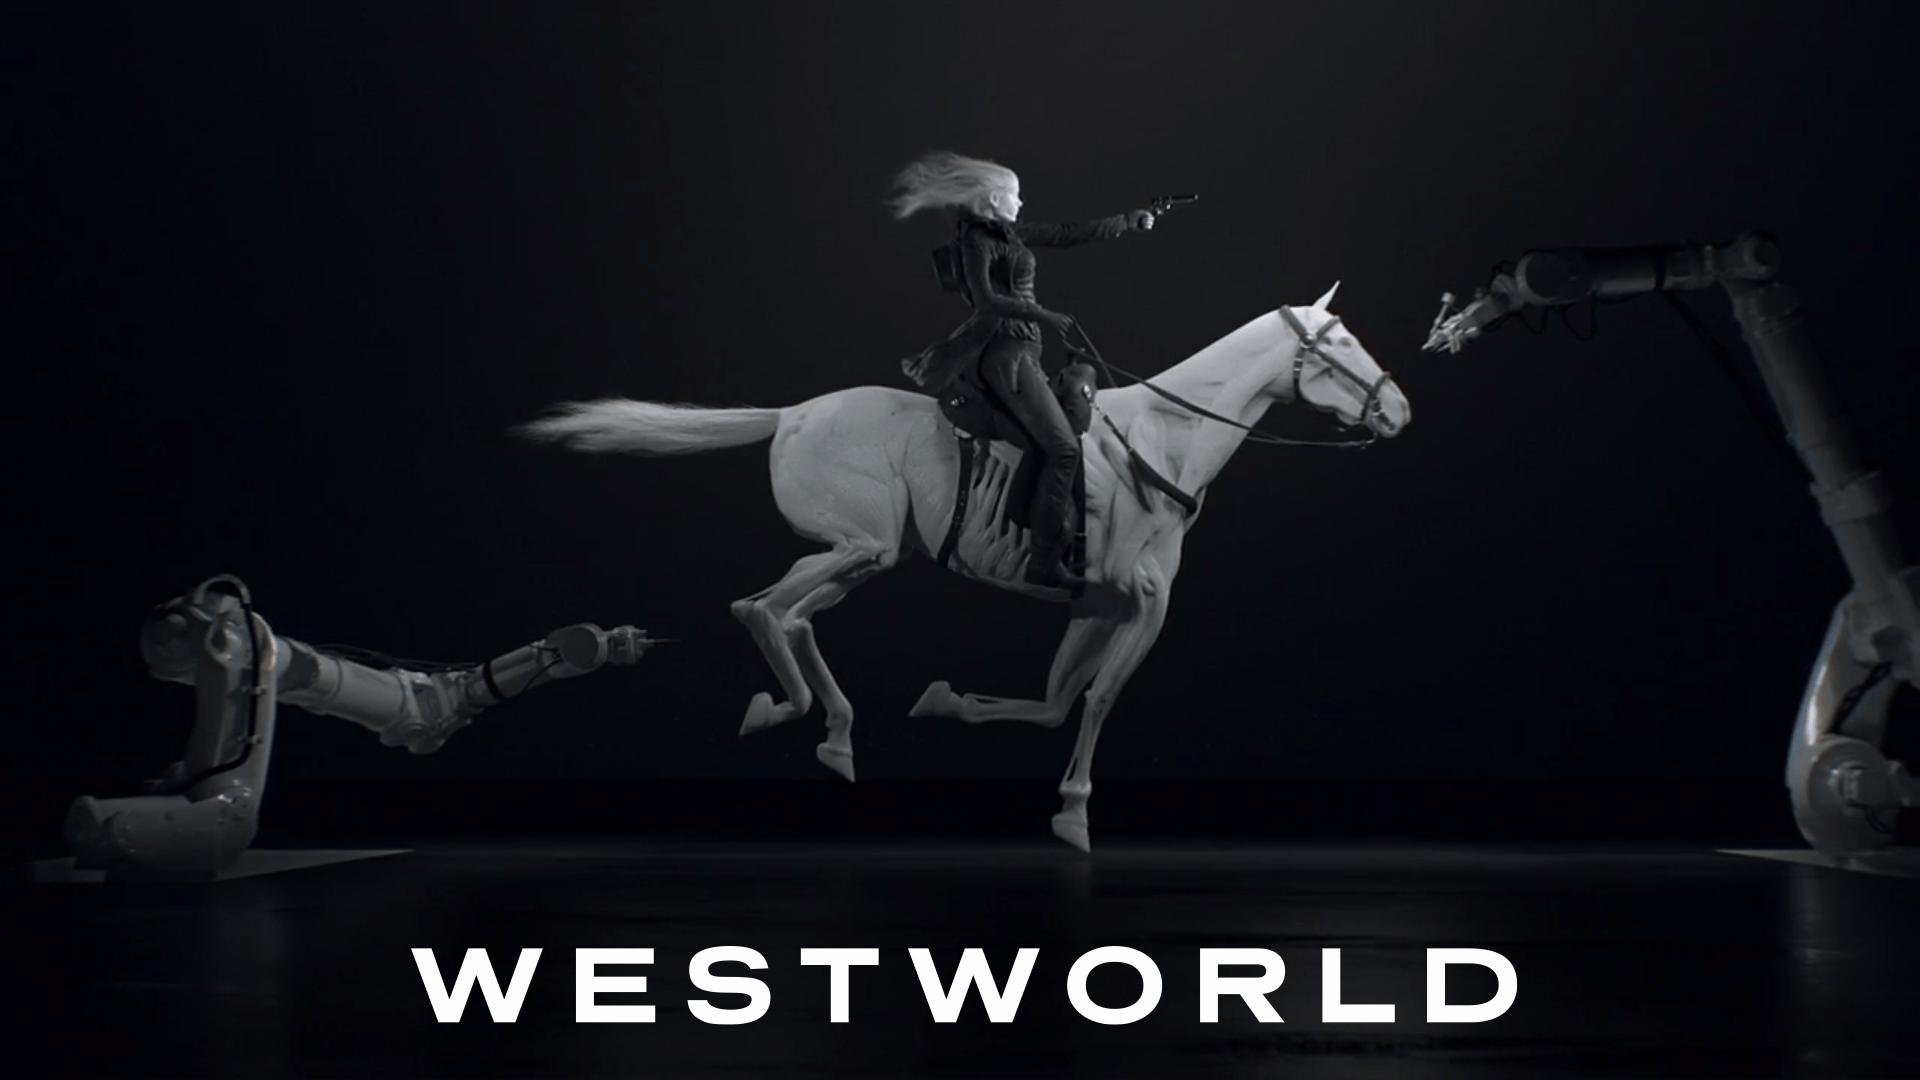 westworld 2 tv show desktop wallpaper 64252